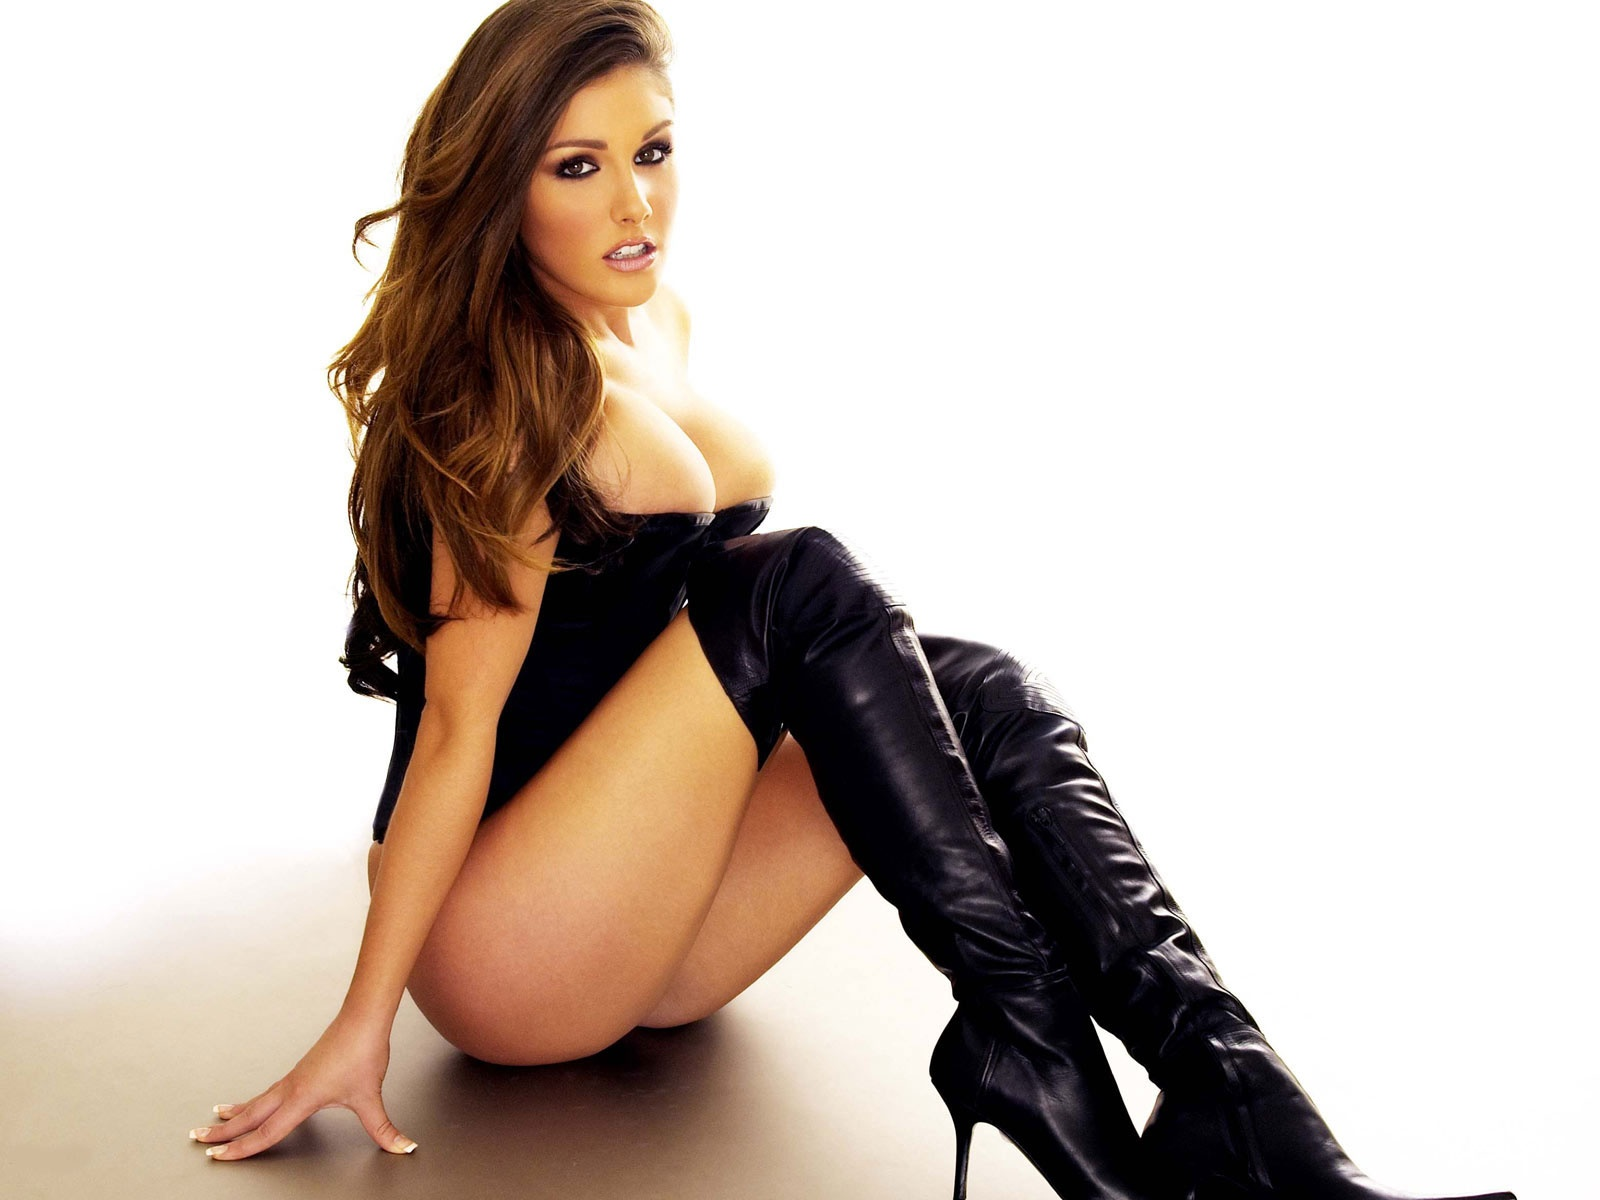 sexy_lucy_pinder_black%2B7.jpg